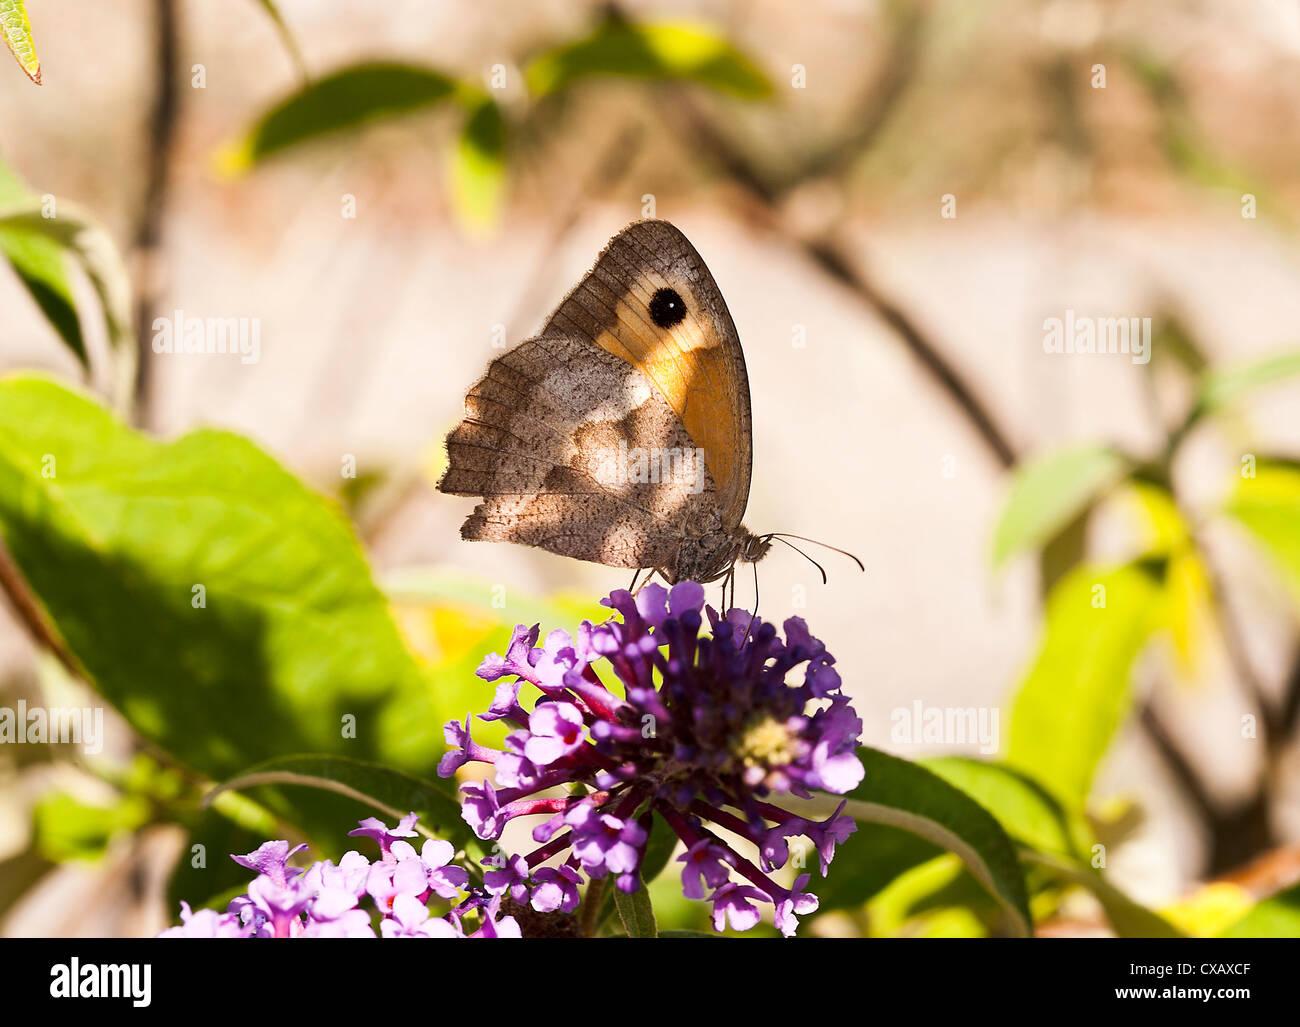 Dusky Meadow Brown Butterfly Feeding on Nectar on a Purple Buddleja Flower at Laval Aveyron Midi-Pyrenees France - Stock Image